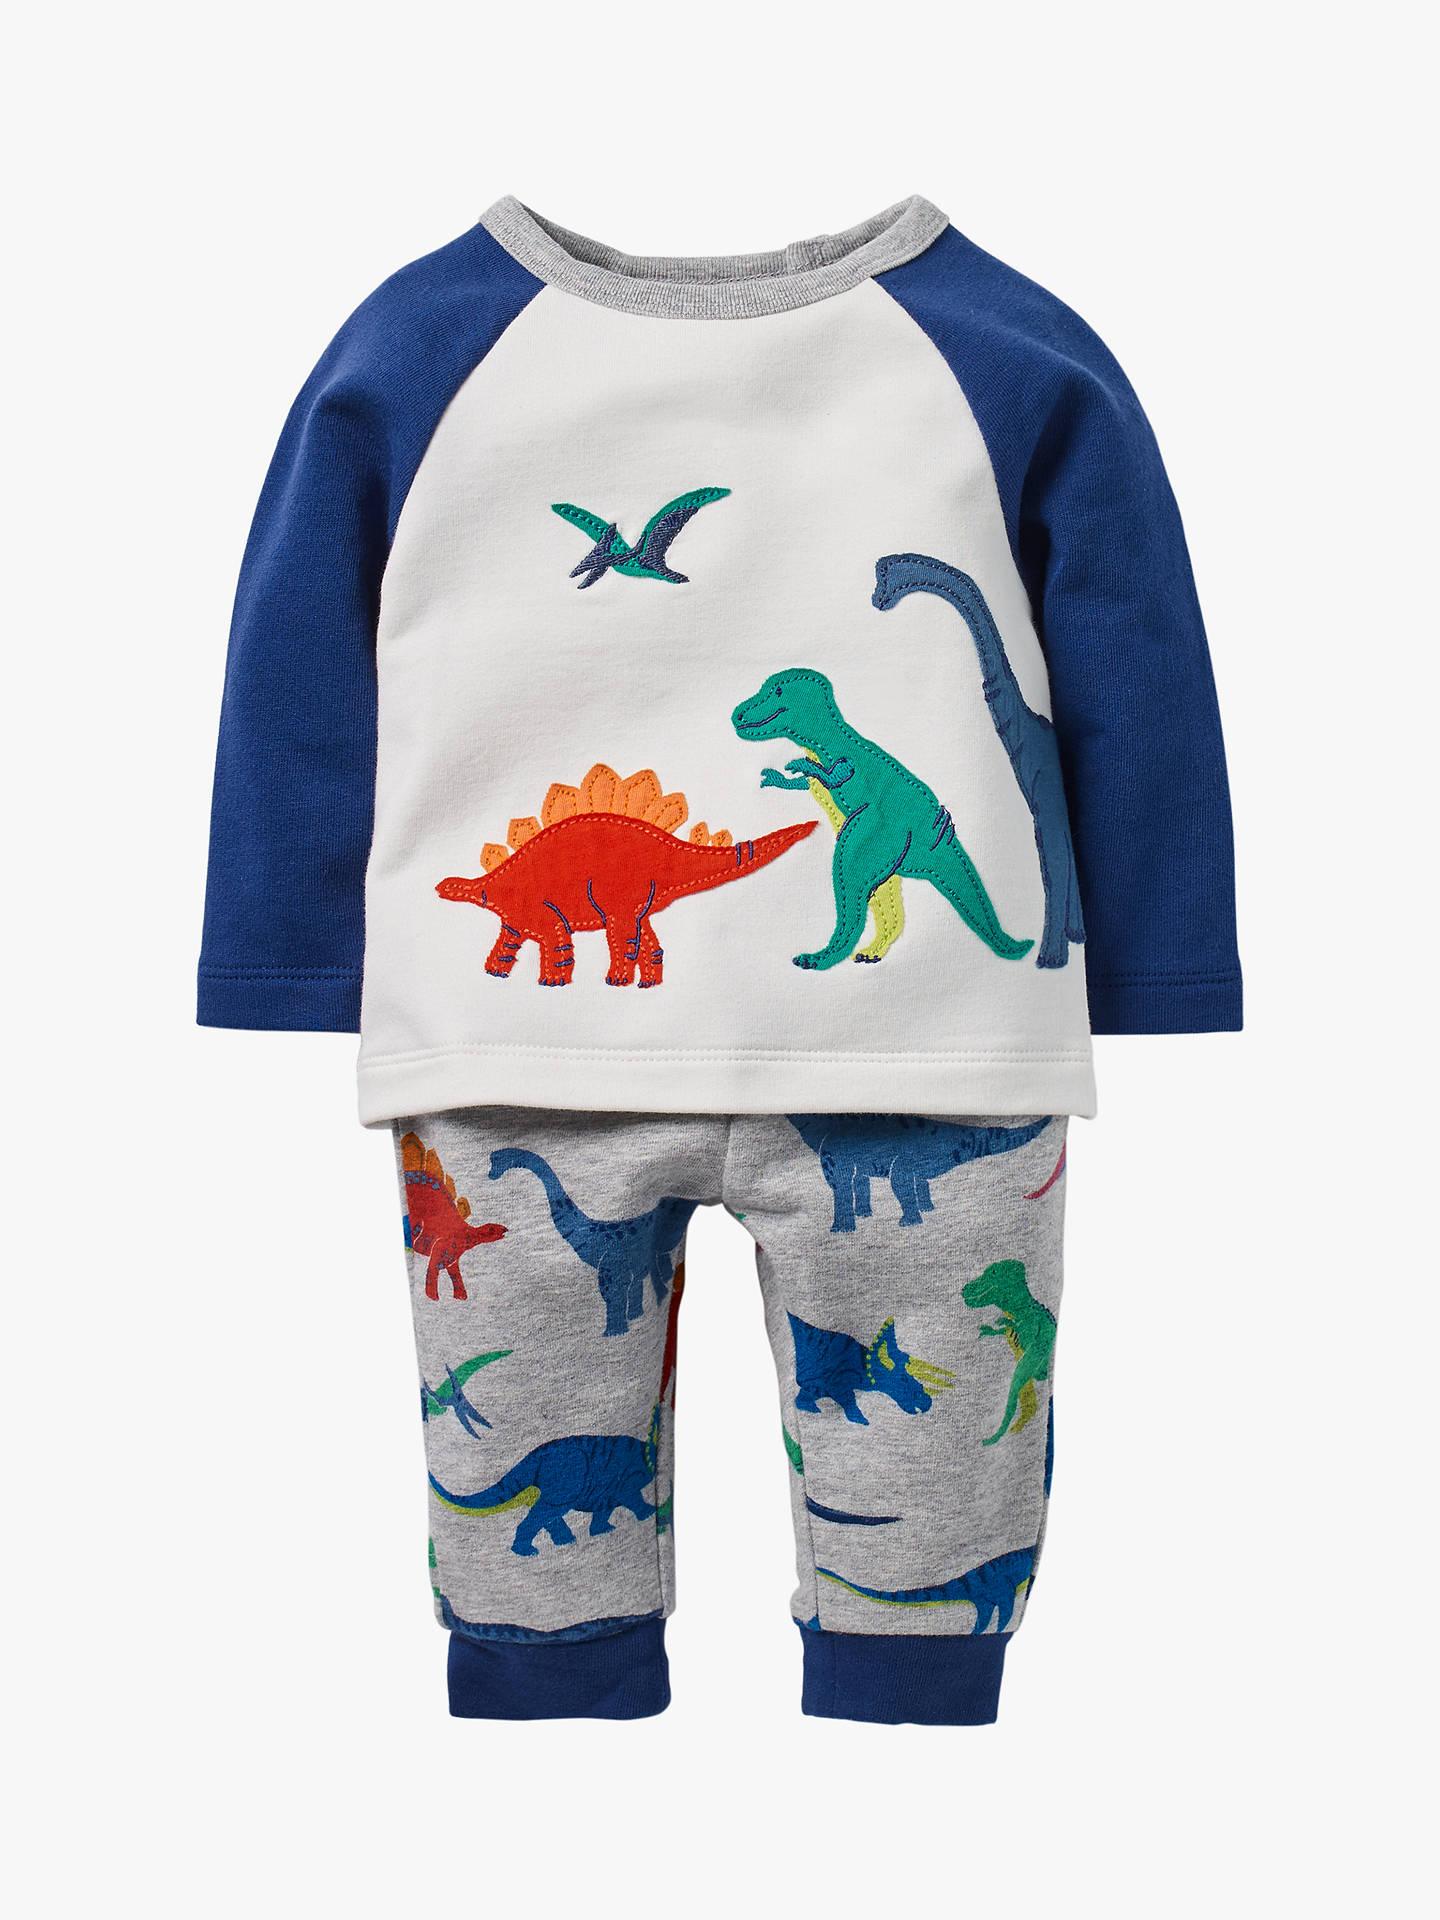 52694a0c3 Mini Boden Babysaurus Appliqué Play Set